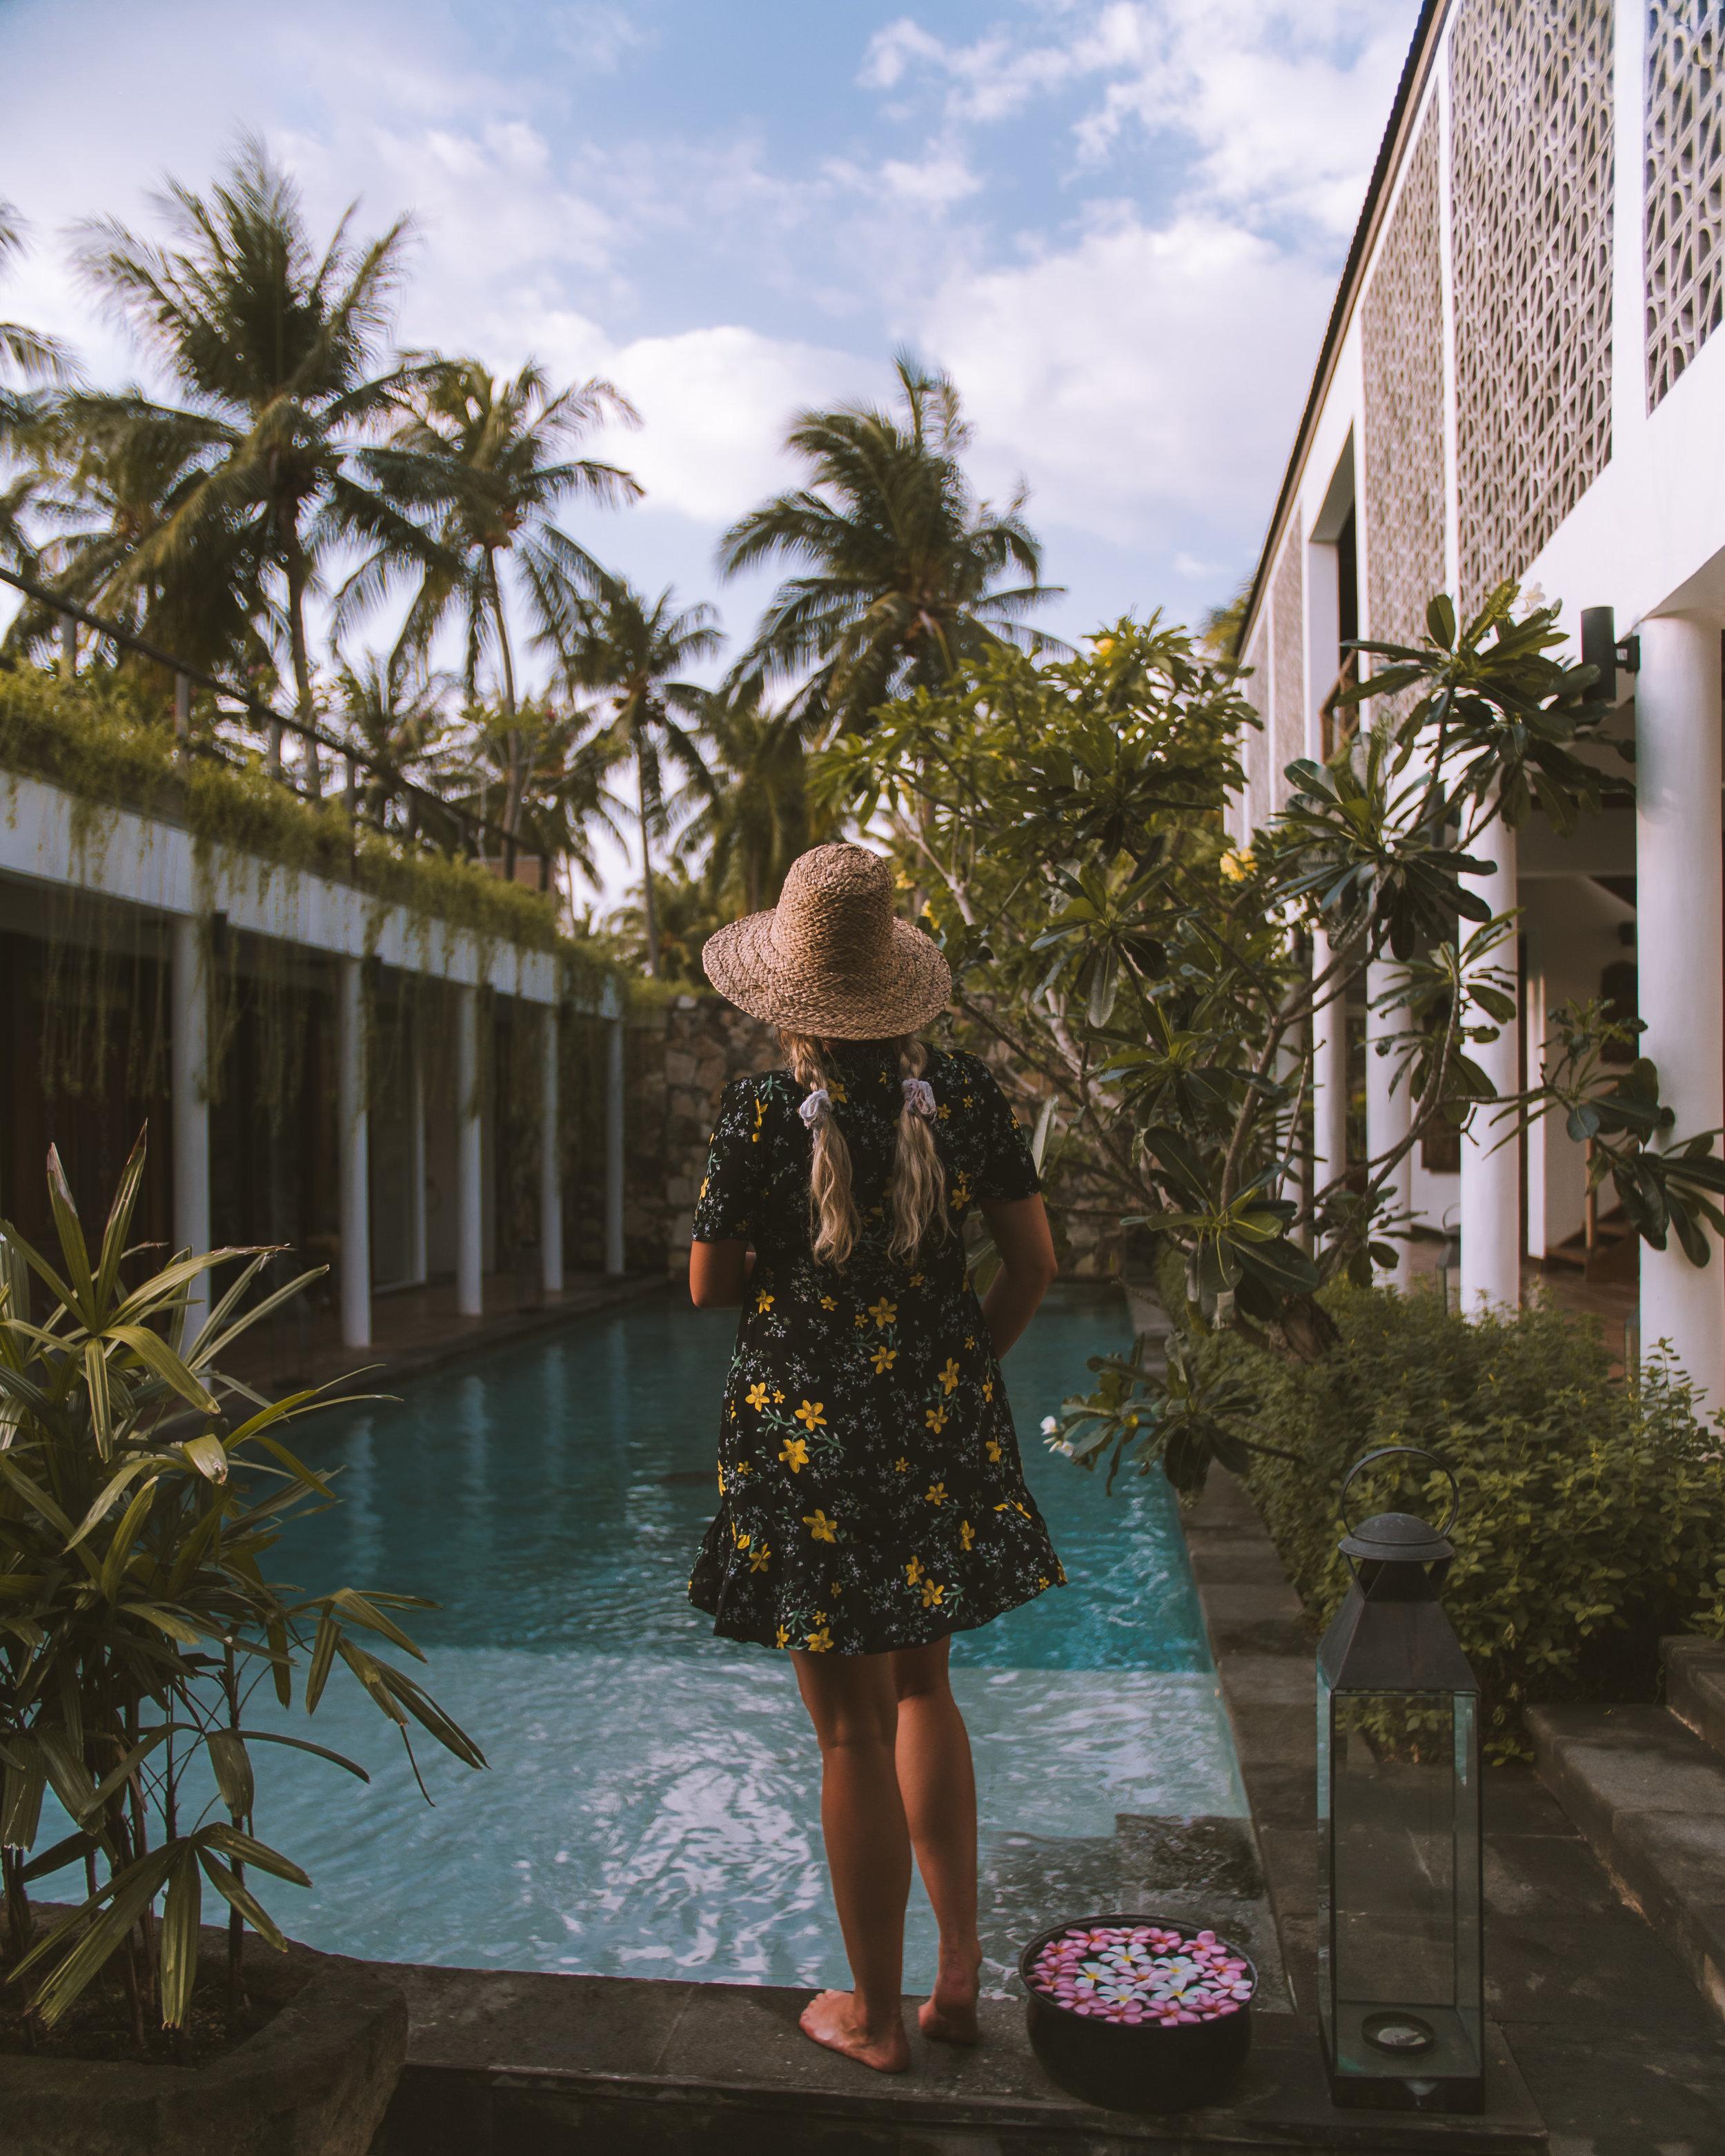 Vancouver-BC-Canada-Travel-Hospitality-Adventure-Commercial-Photographer-Indonesia-Lombok-Emma-Rae.jpg